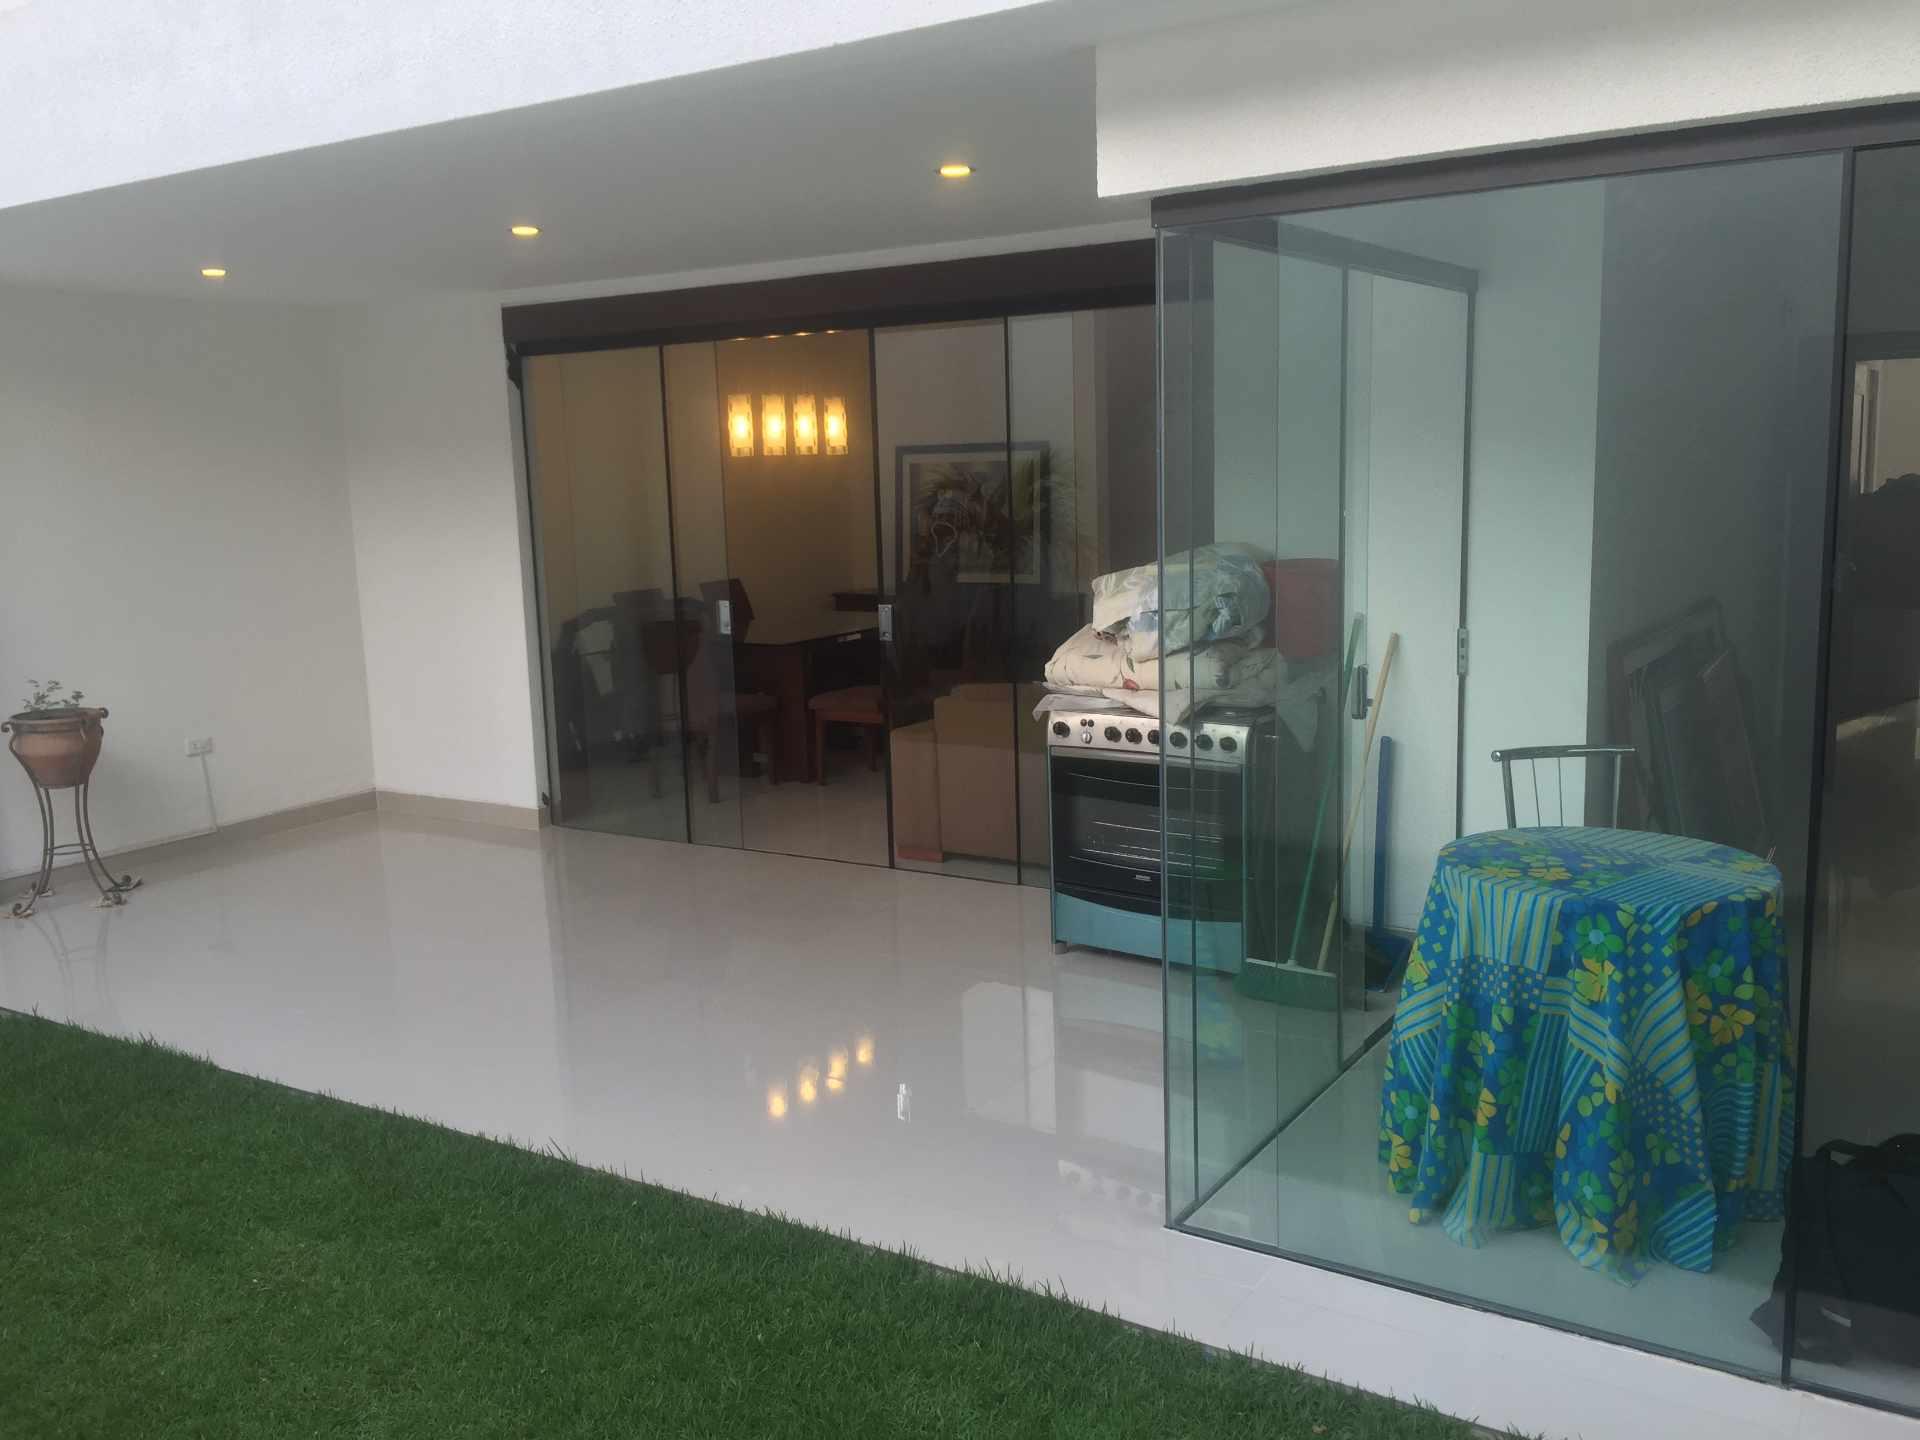 Casa en Alquiler Av. Pirai entre 4to y 5to anillo Cond. Santa Monica Foto 3